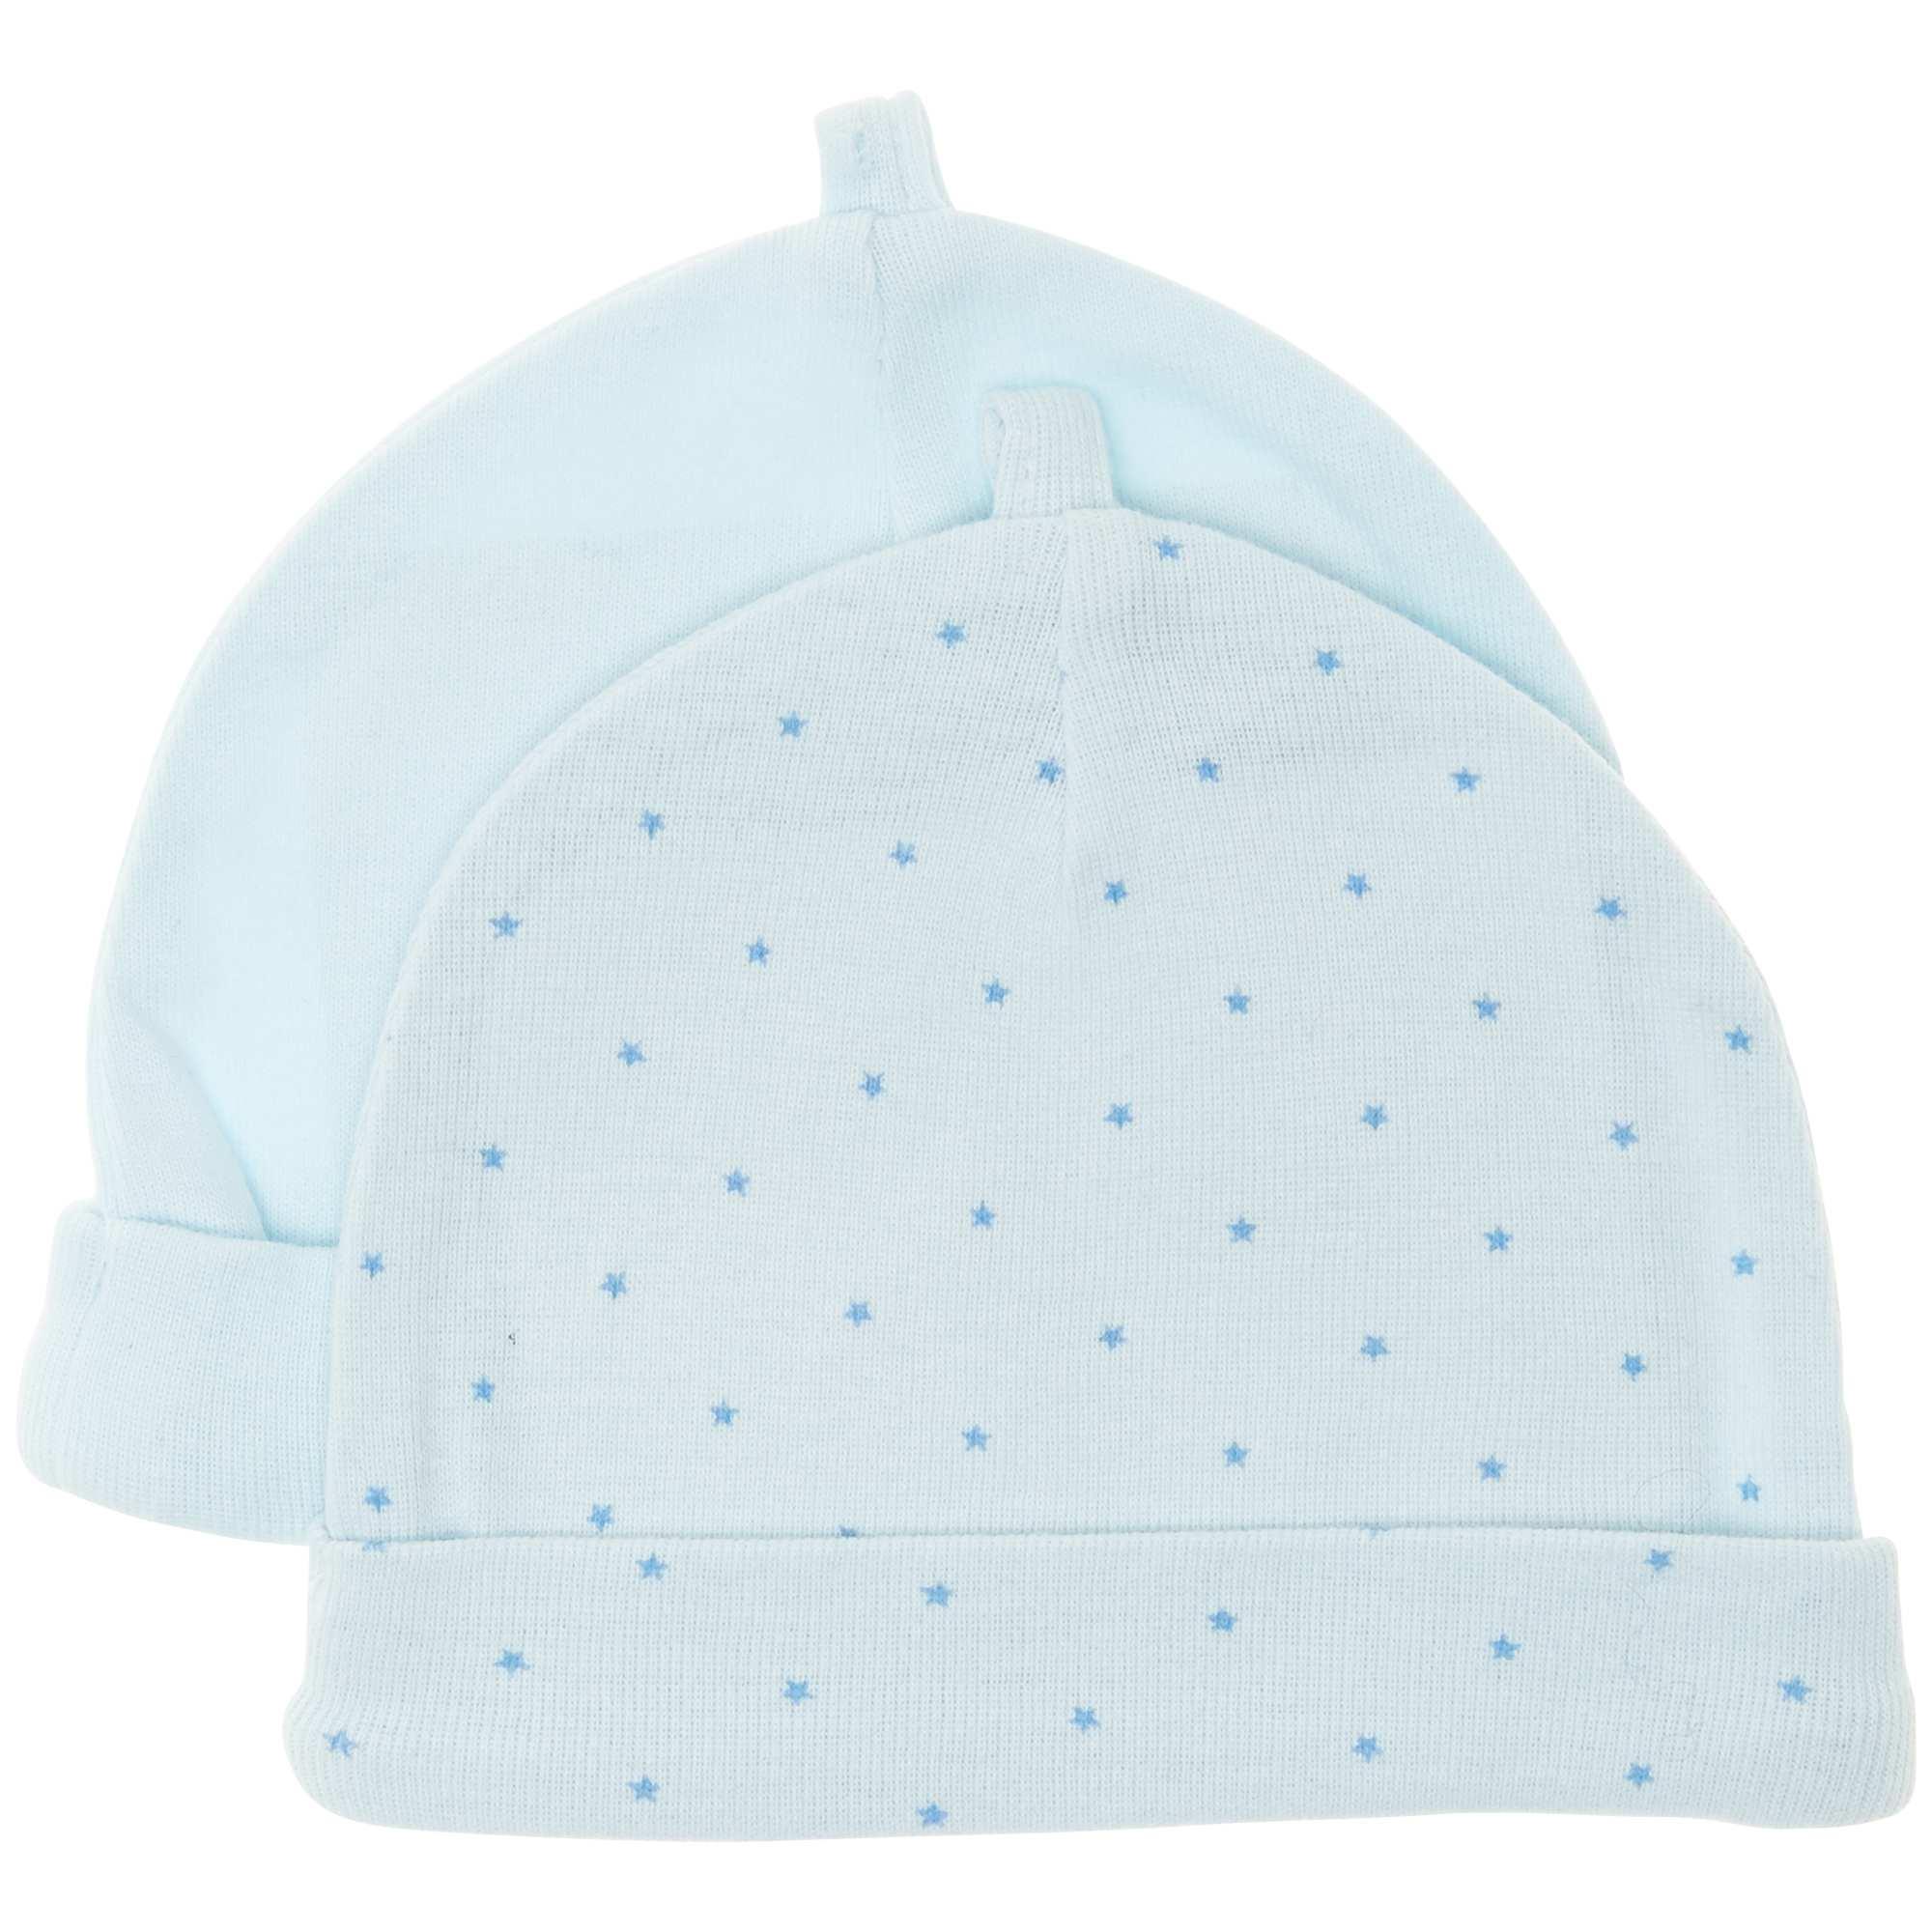 cd2c5dbca Pack de 2 gorros de algodón orgánico Bebé niño - azul - Kiabi - 4